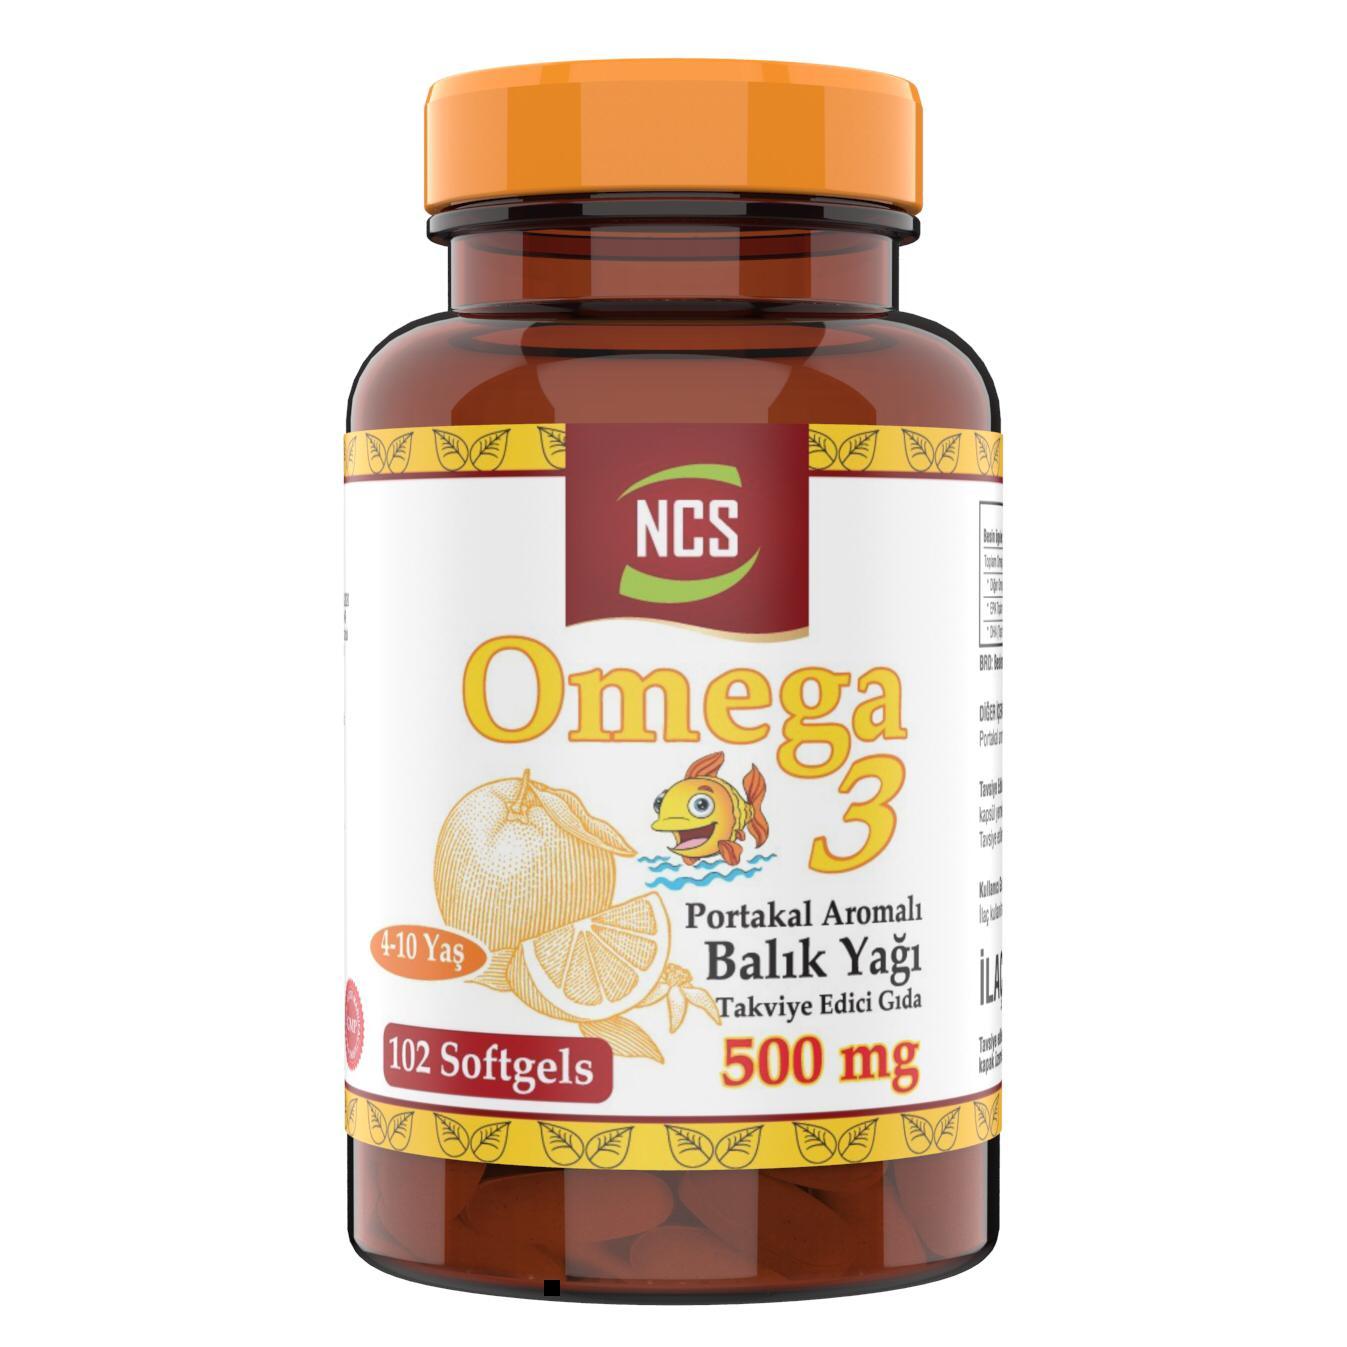 NCS Omega 3 aceite de pescado con sabor a naranja 500mg Softgel 102 para niños